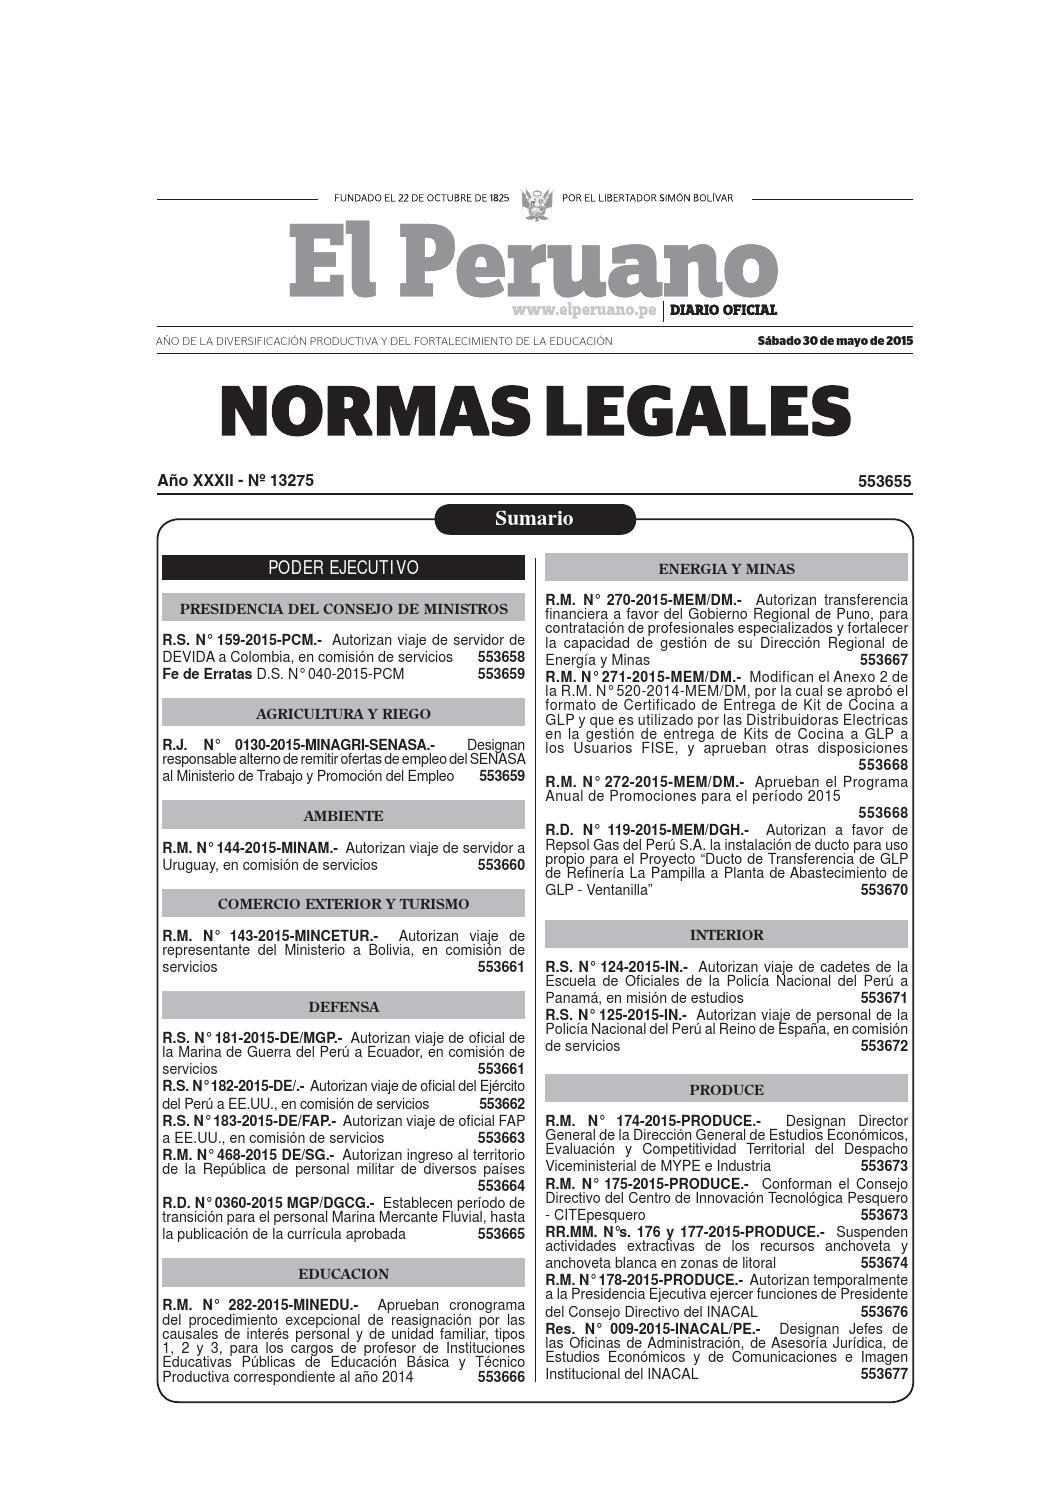 BOLETIN DEL DIARIO OFICIAL 30 05 2015 by Gaceta Juridica - issuu